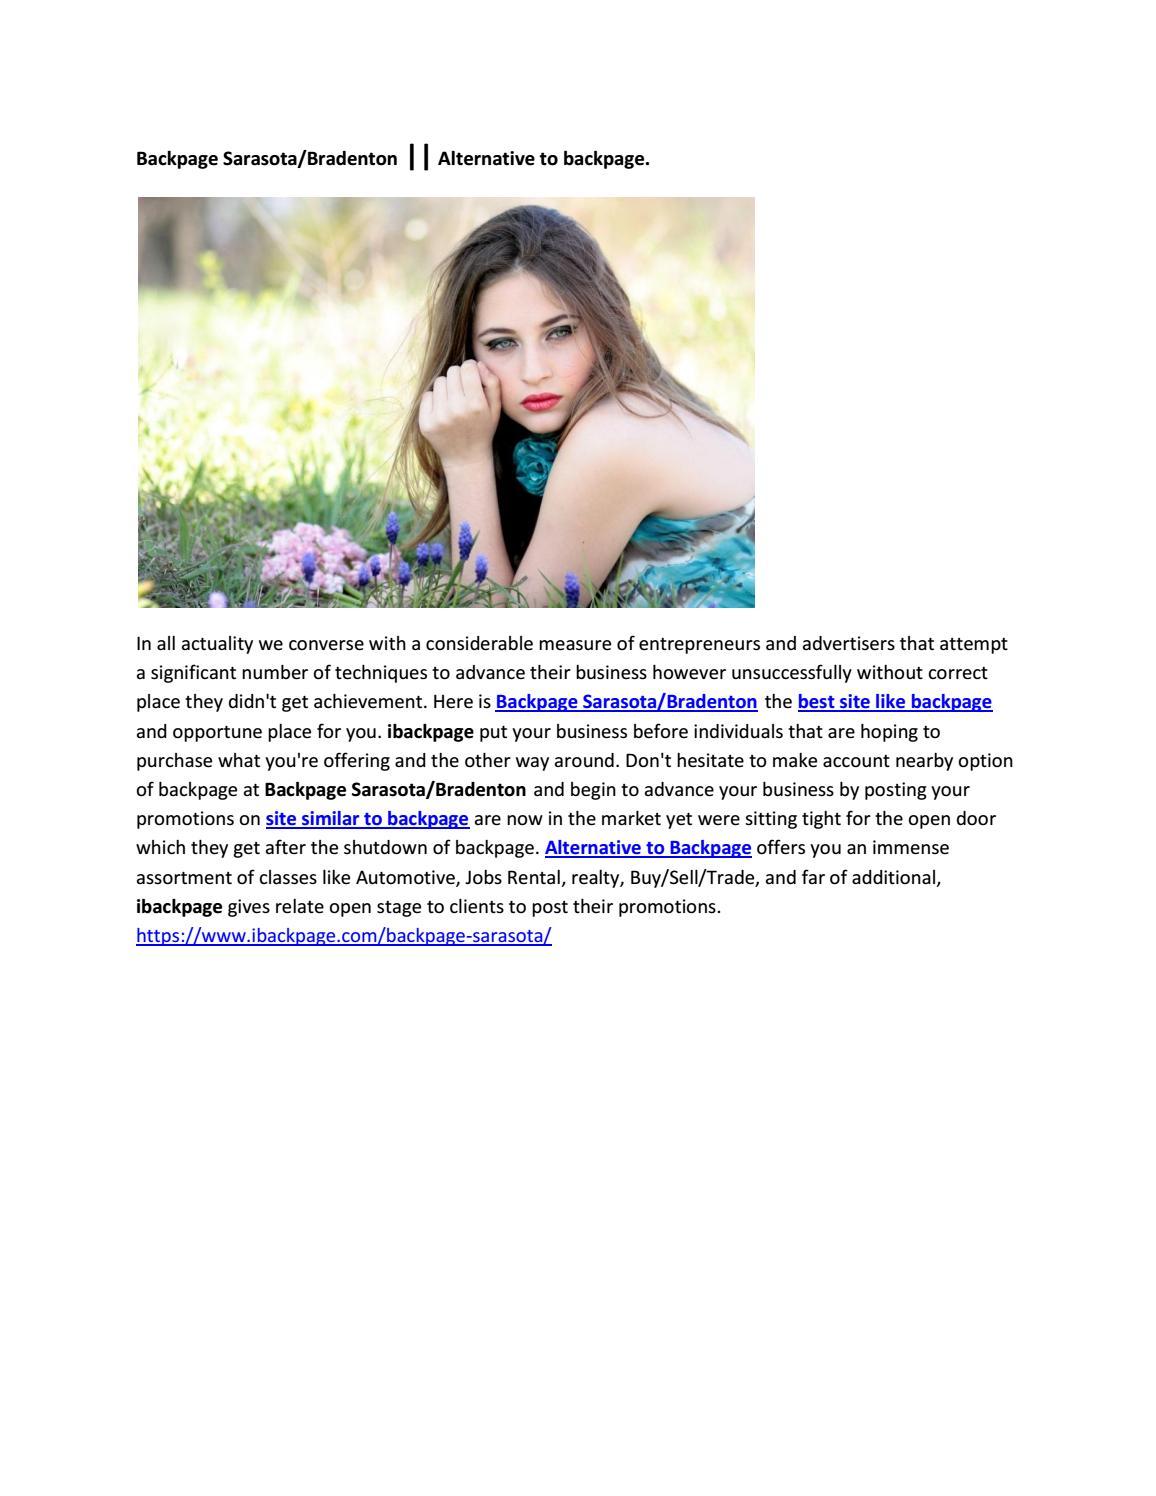 Backpage Sarasota/Bradenton is Sites like backpage. by